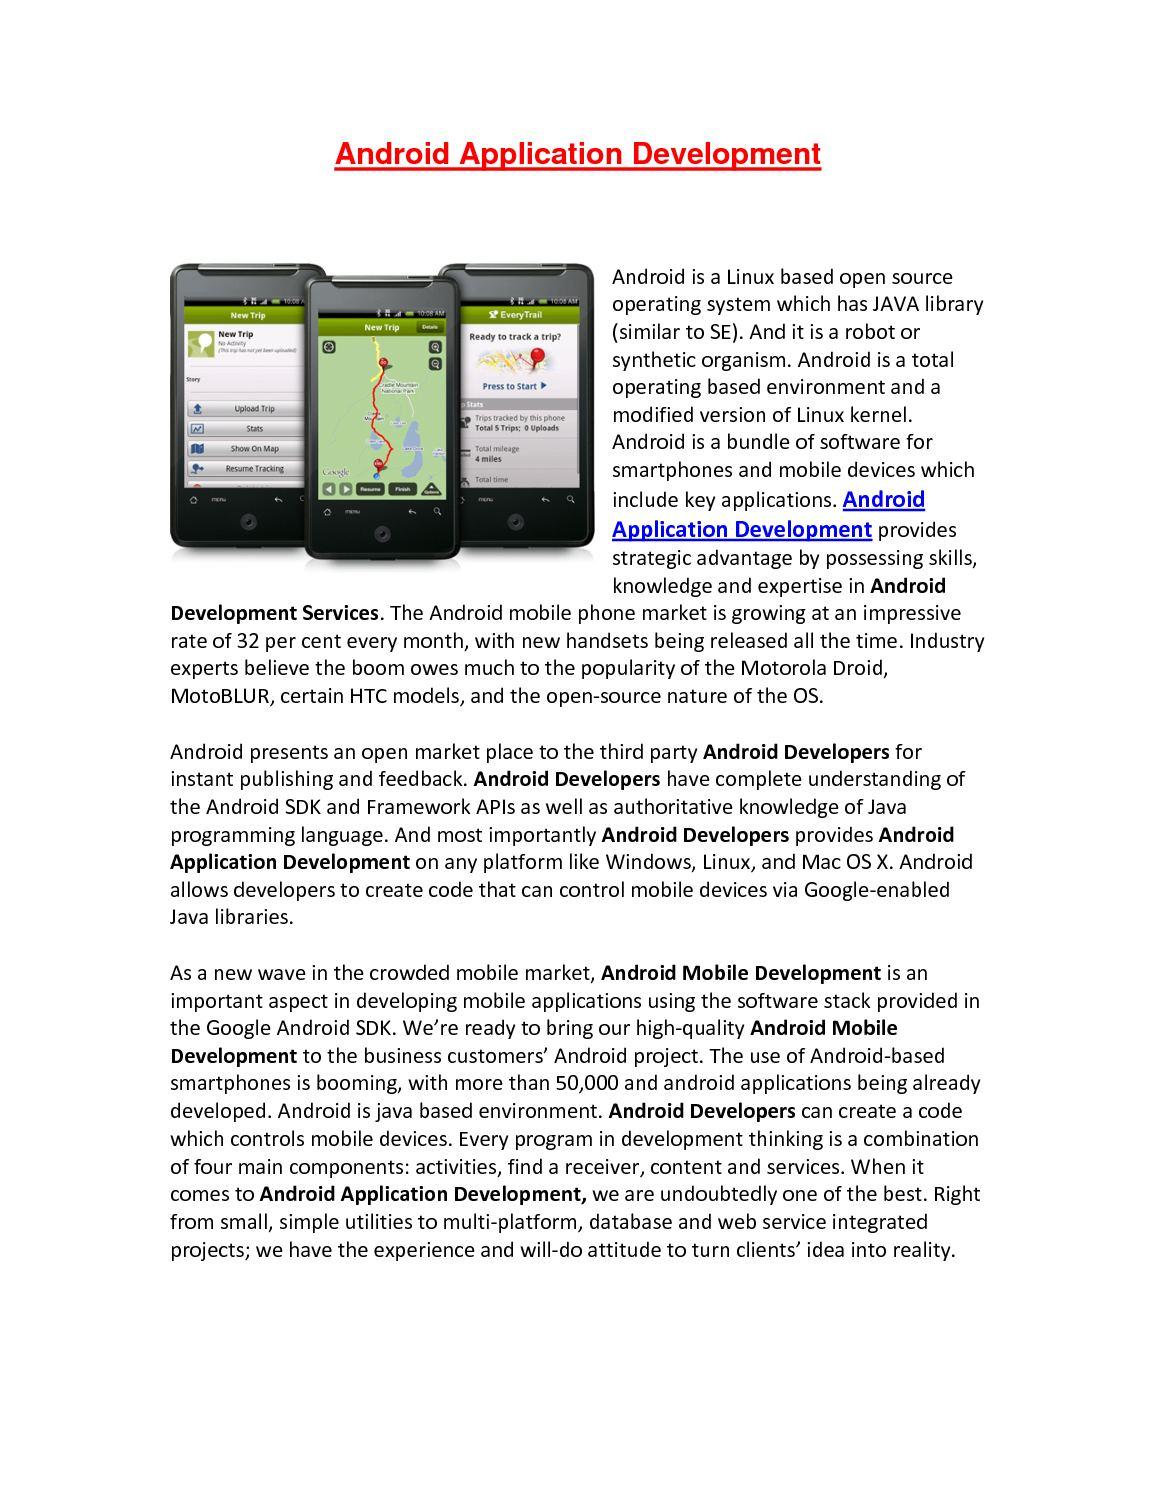 Calaméo - Android Application Development